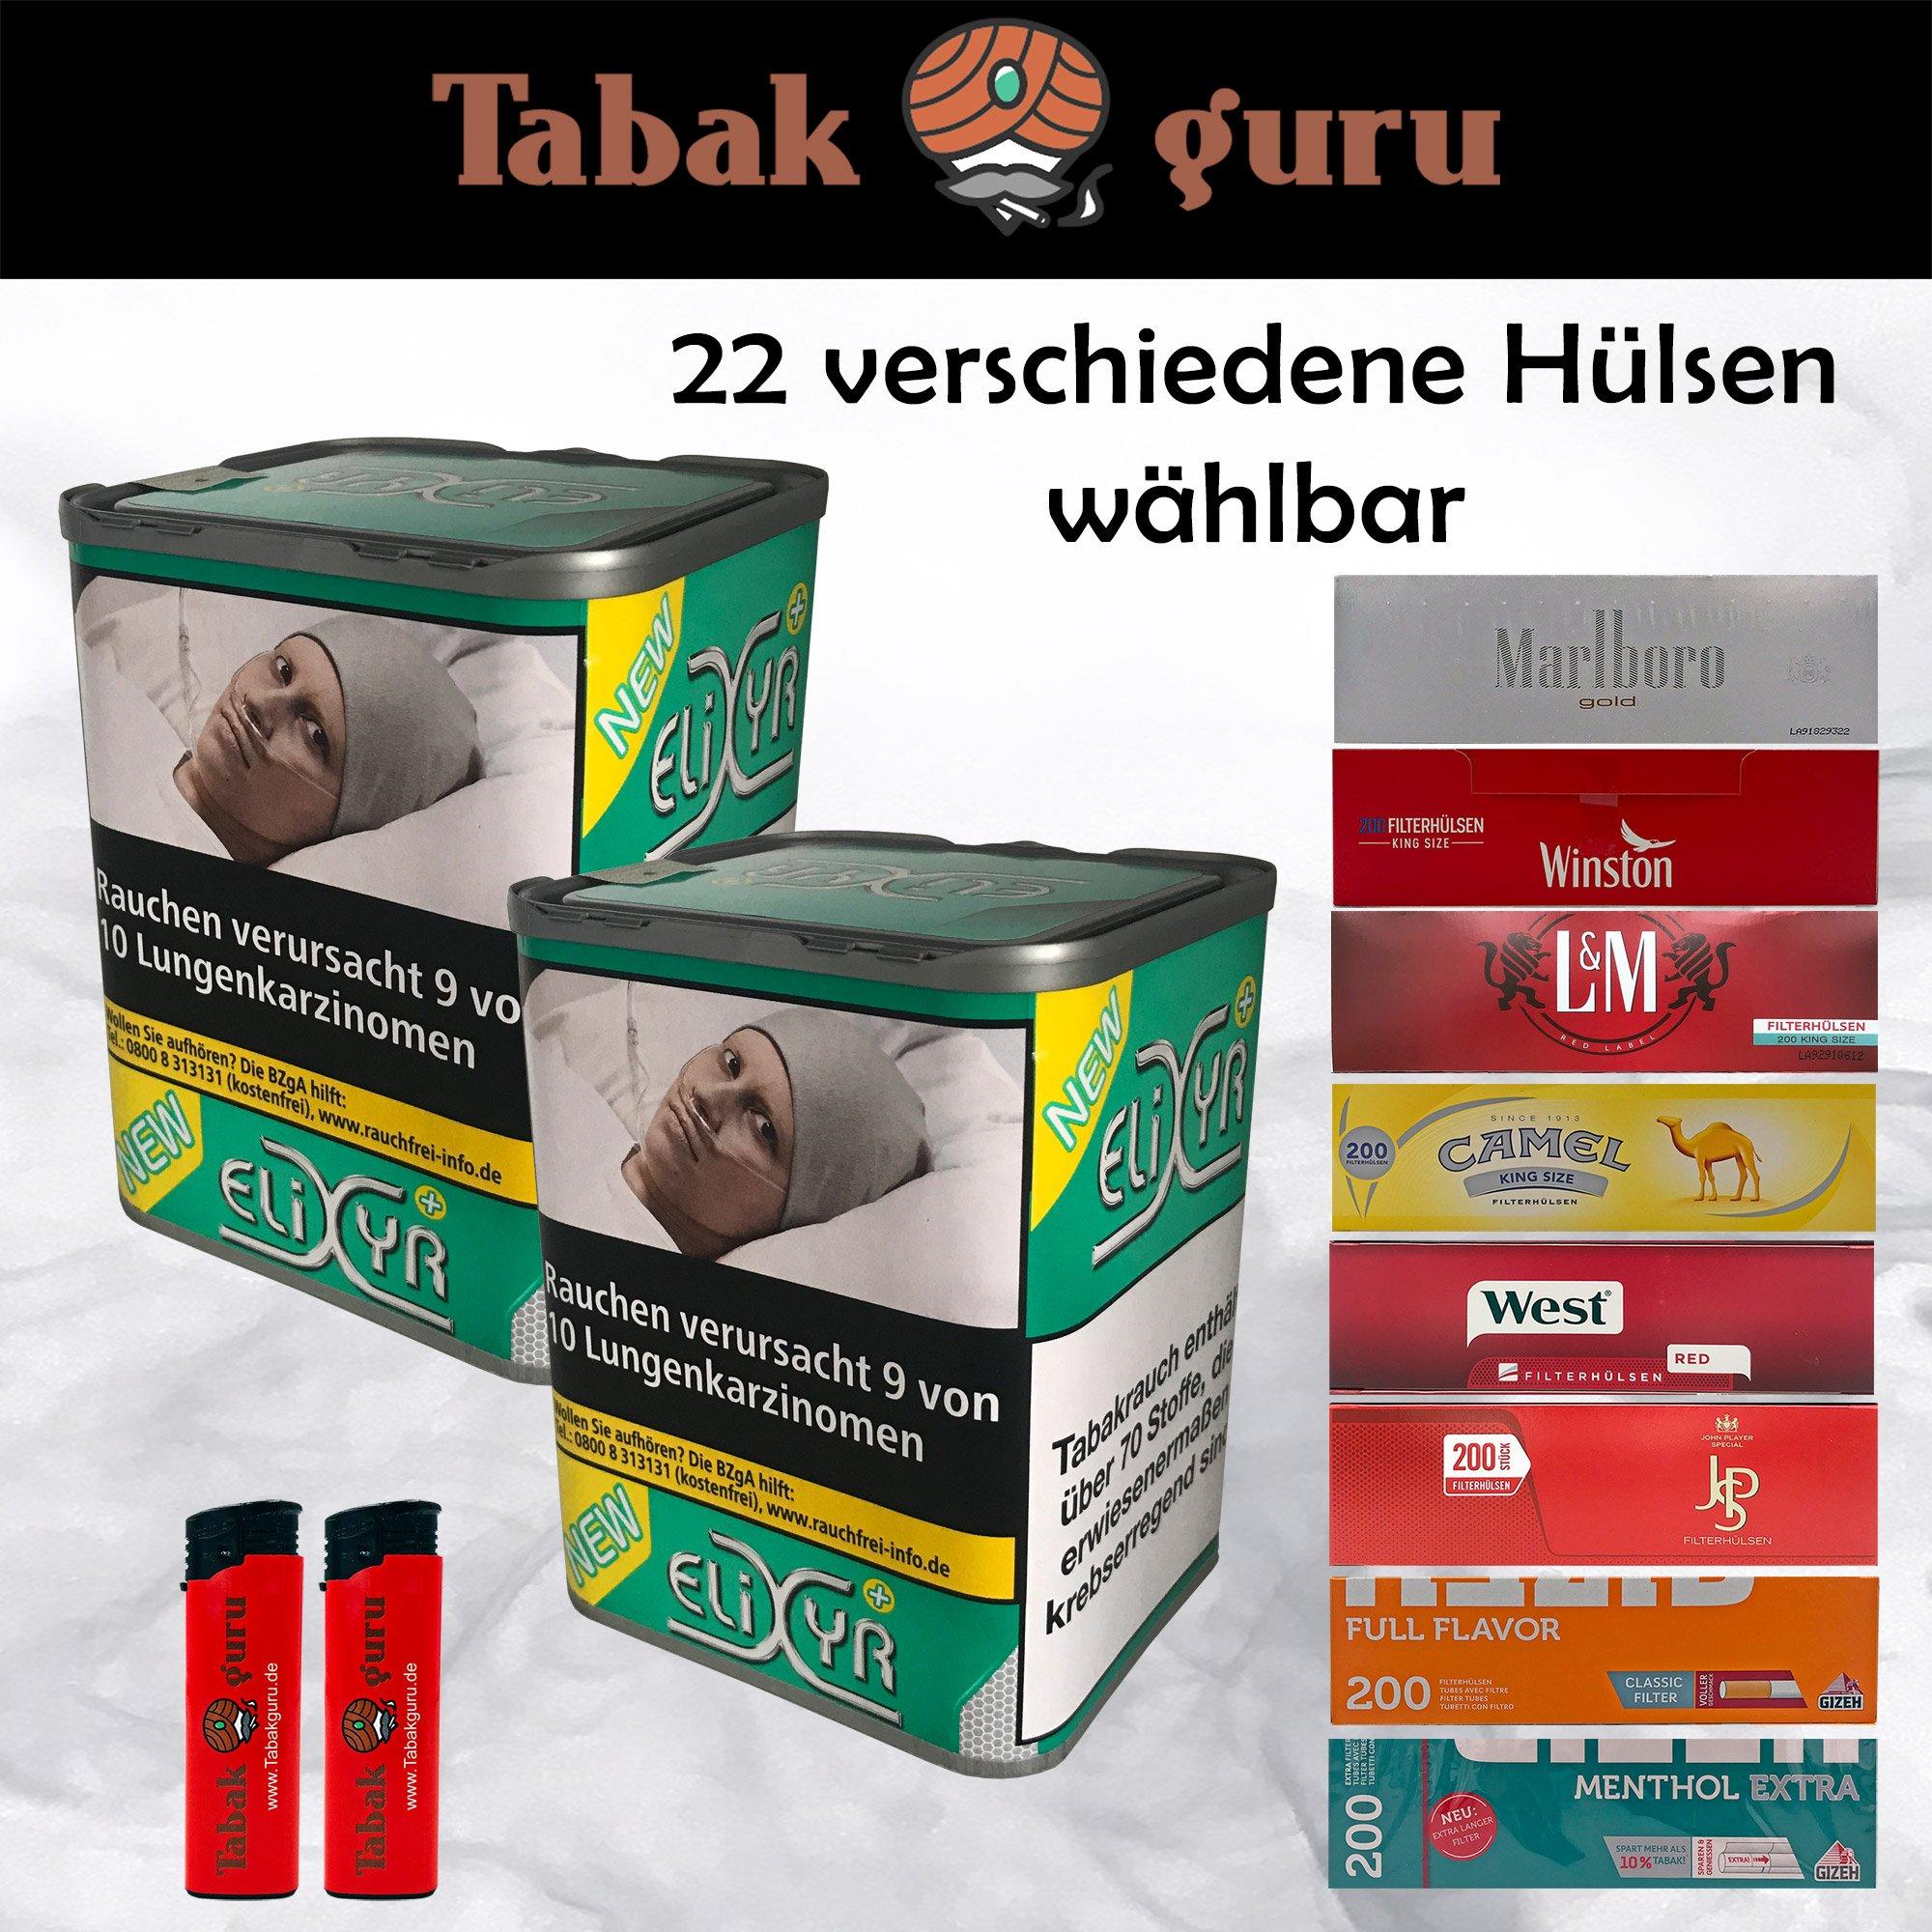 2 x Elixyr PLUS 115g Tabak + 2 Packungen Hülsen wählbar + Feuerzeuge